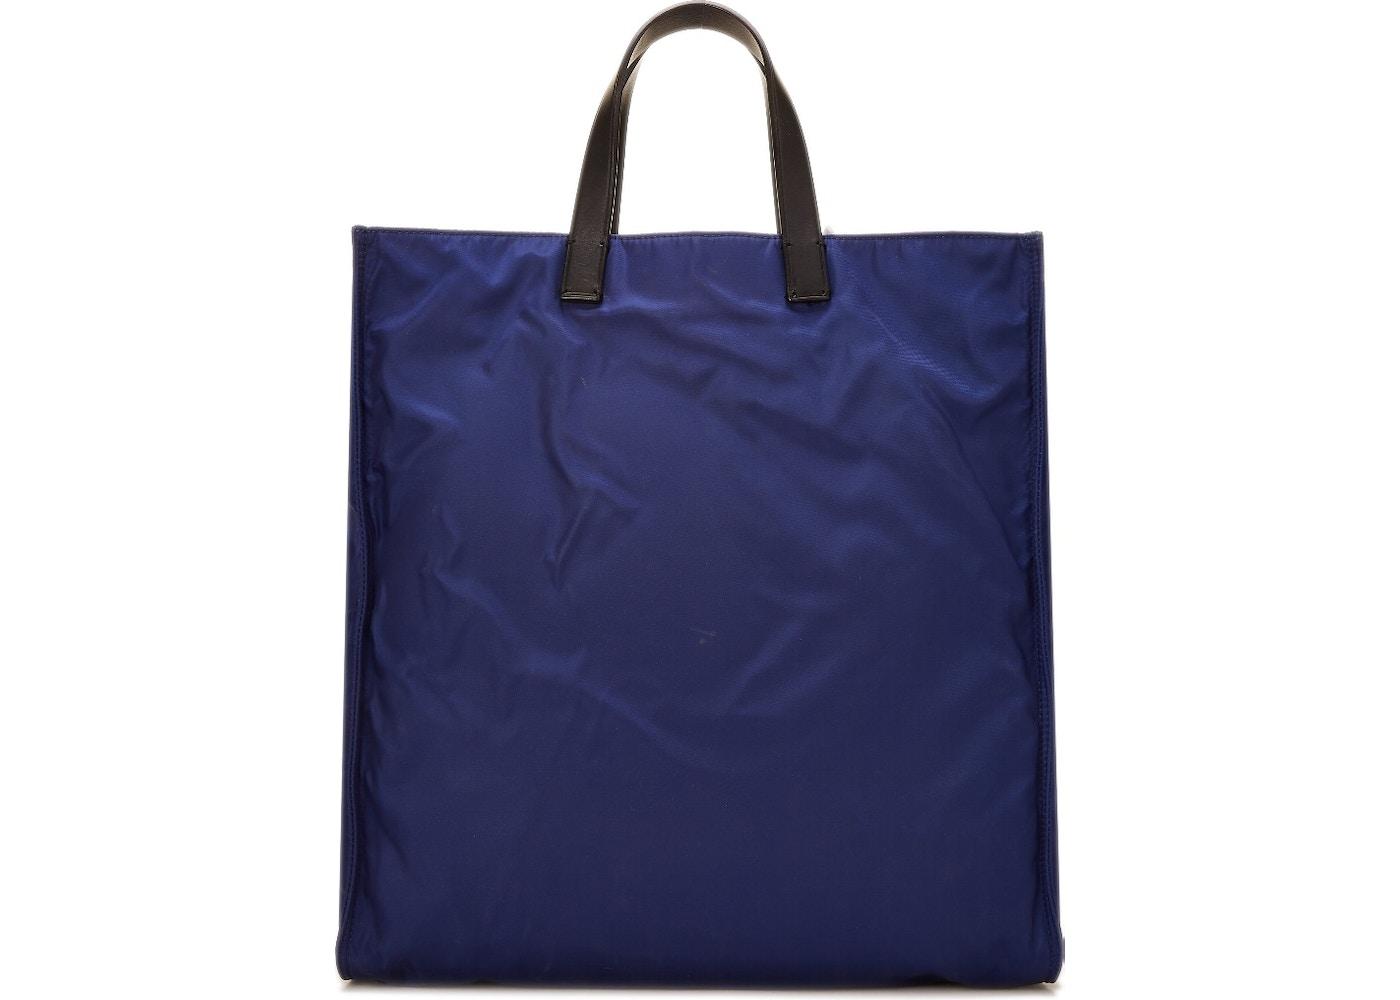 56852fade566 Fendi Monster Tote Nylon Blue